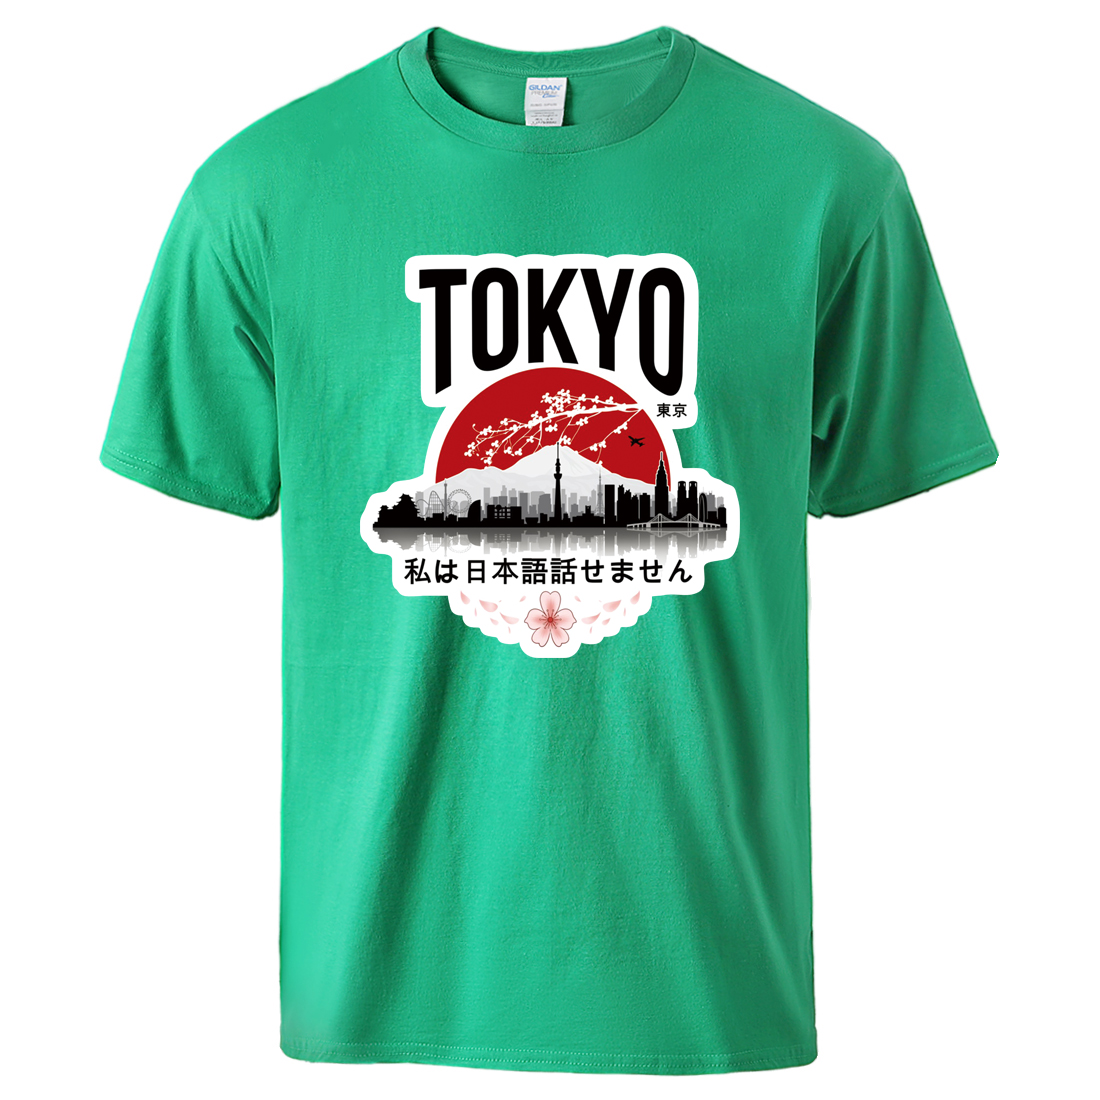 Tokyo I Don't Speak Japanese Print T Shirts Man Causal Short Sleeve Sportswear Tee 2020 Summer Man Brand Loose Cotton T Shirts